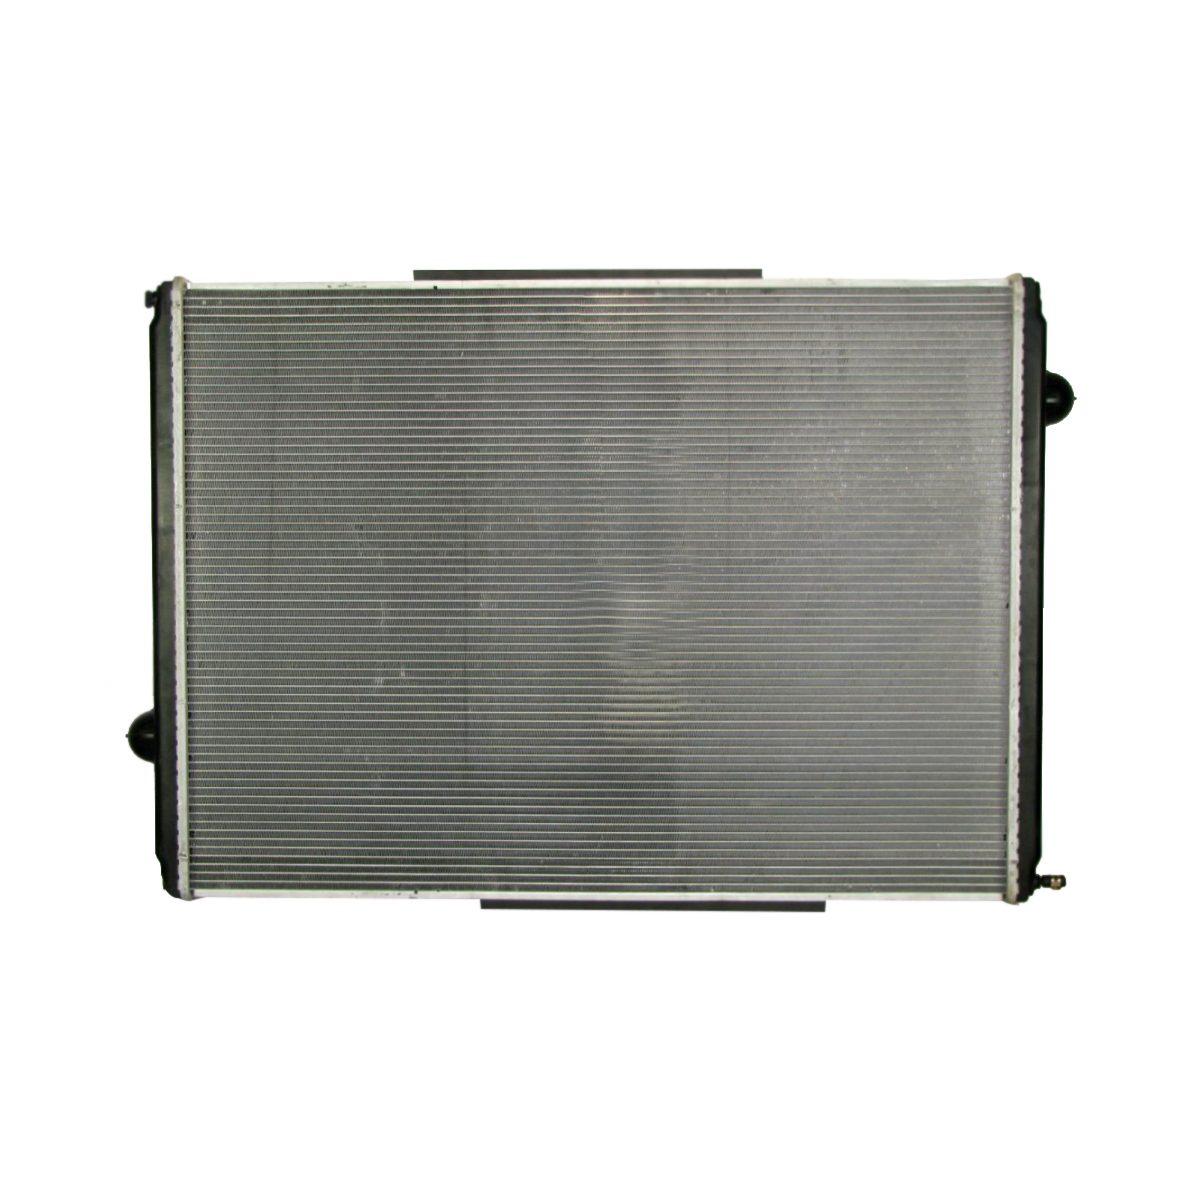 ford sterling lt 9500 at 9500 series 98 99 radiator oem vab1030138 2